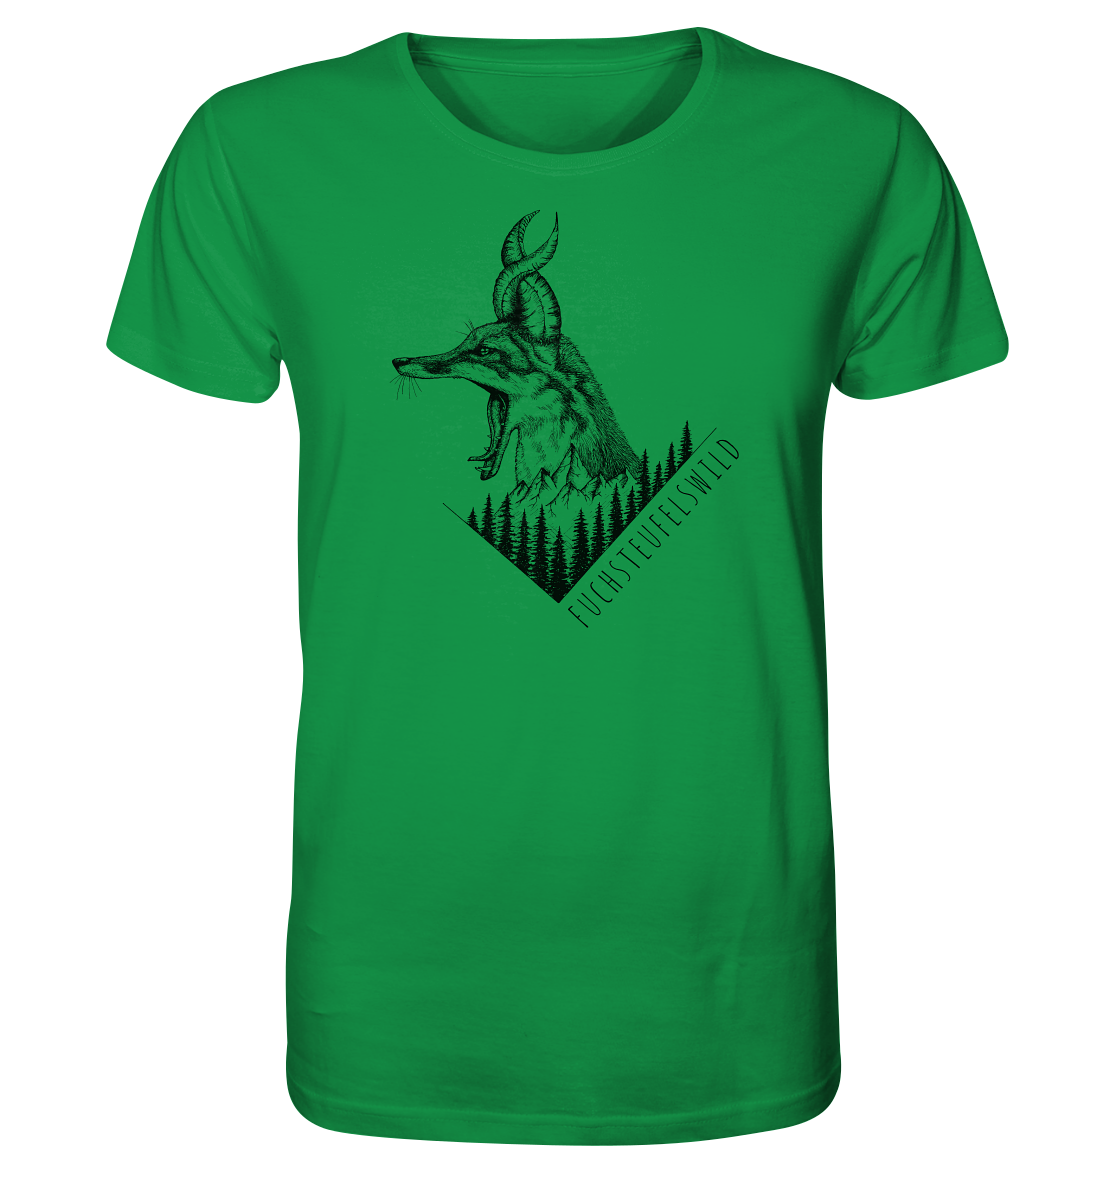 front-organic-shirt-149348-1116x-7.png